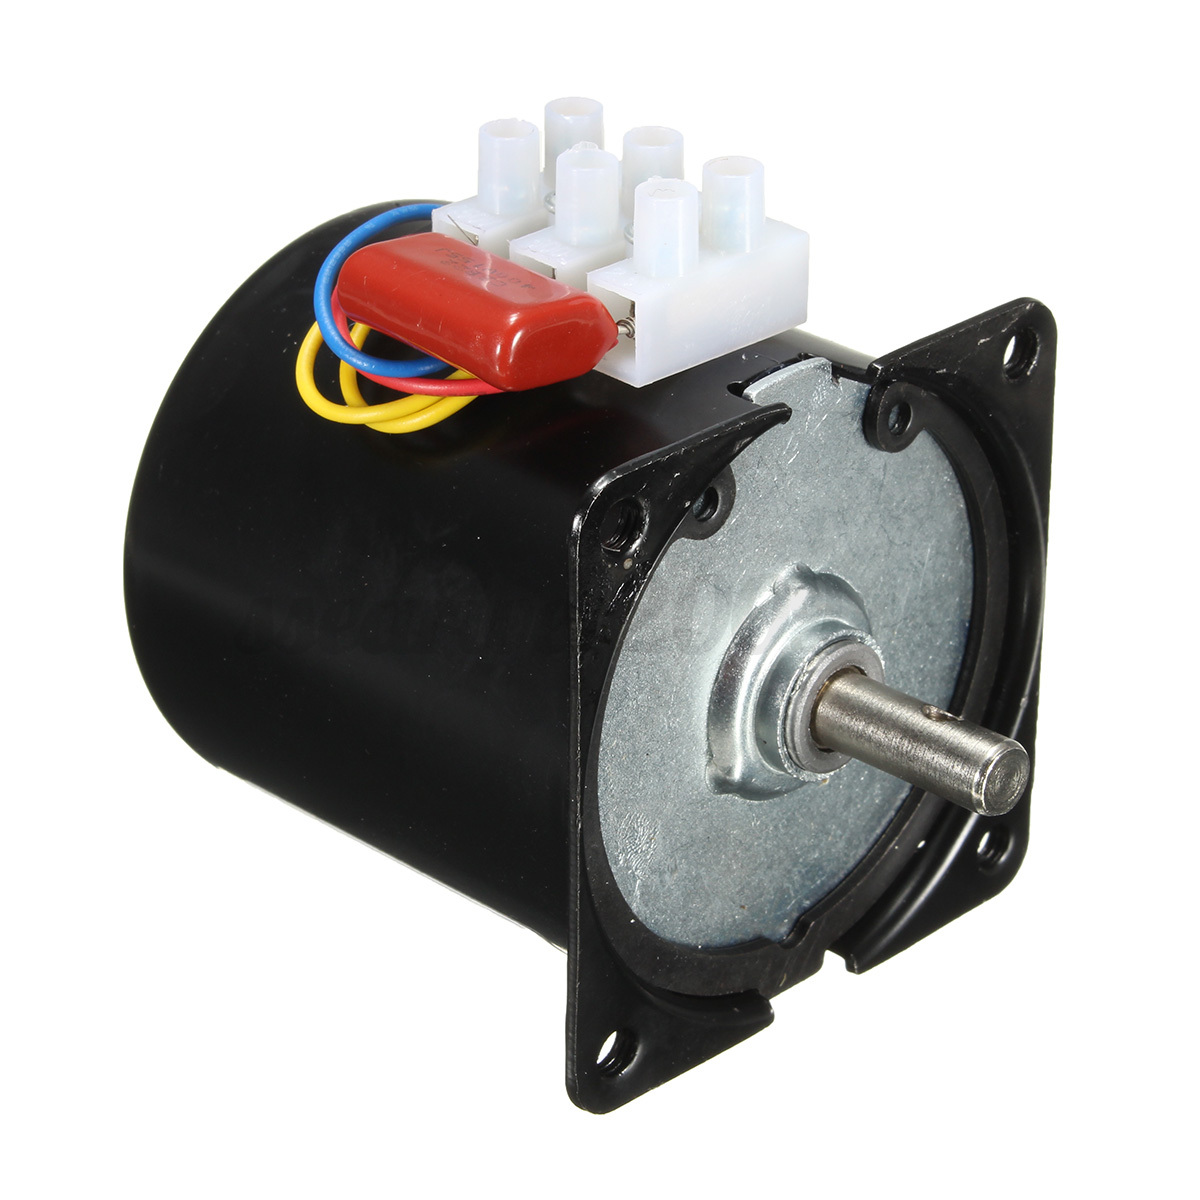 Synchronous Motor Ac110v 14w 30rpm Min Slow Gear Speed